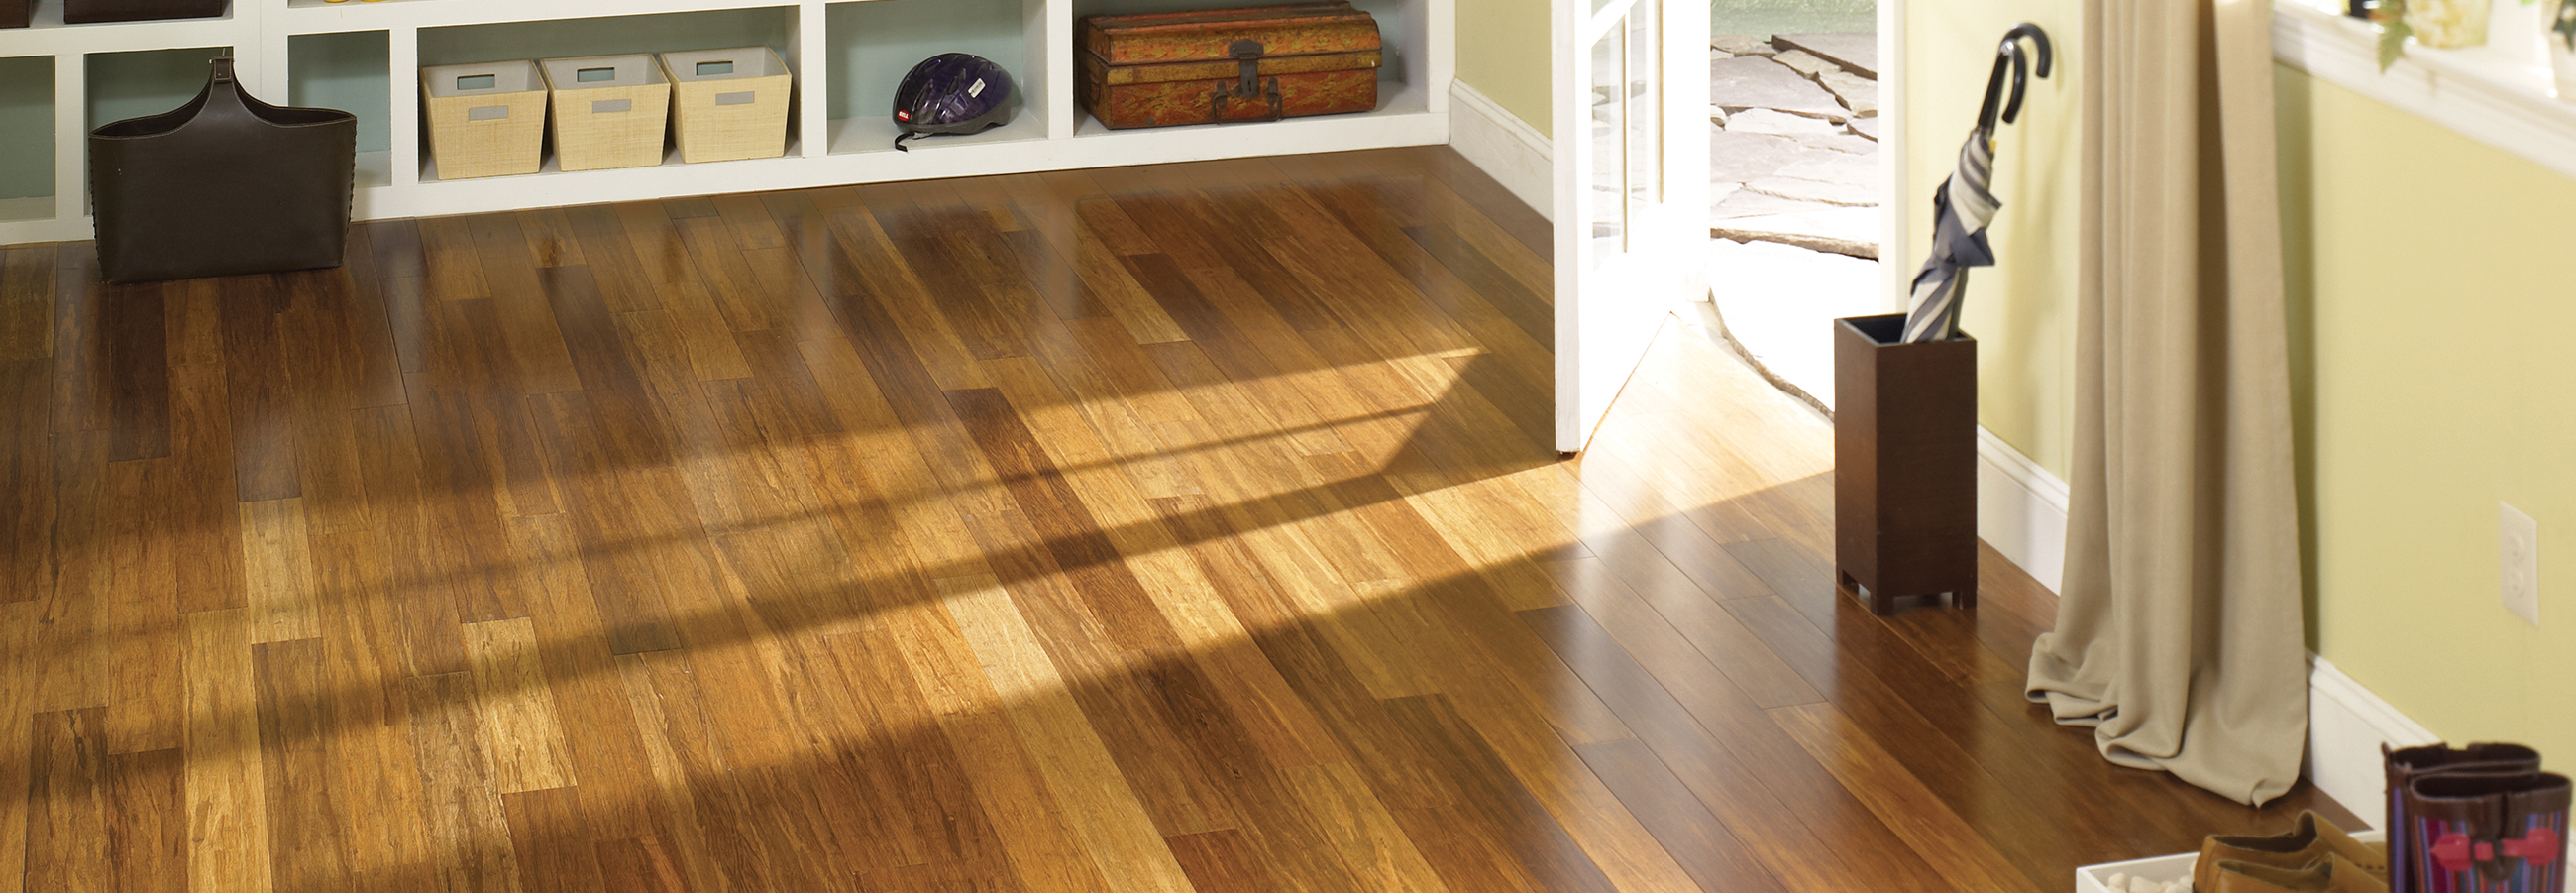 Wood Floor Refinishing Sergenian S Floor Coverings